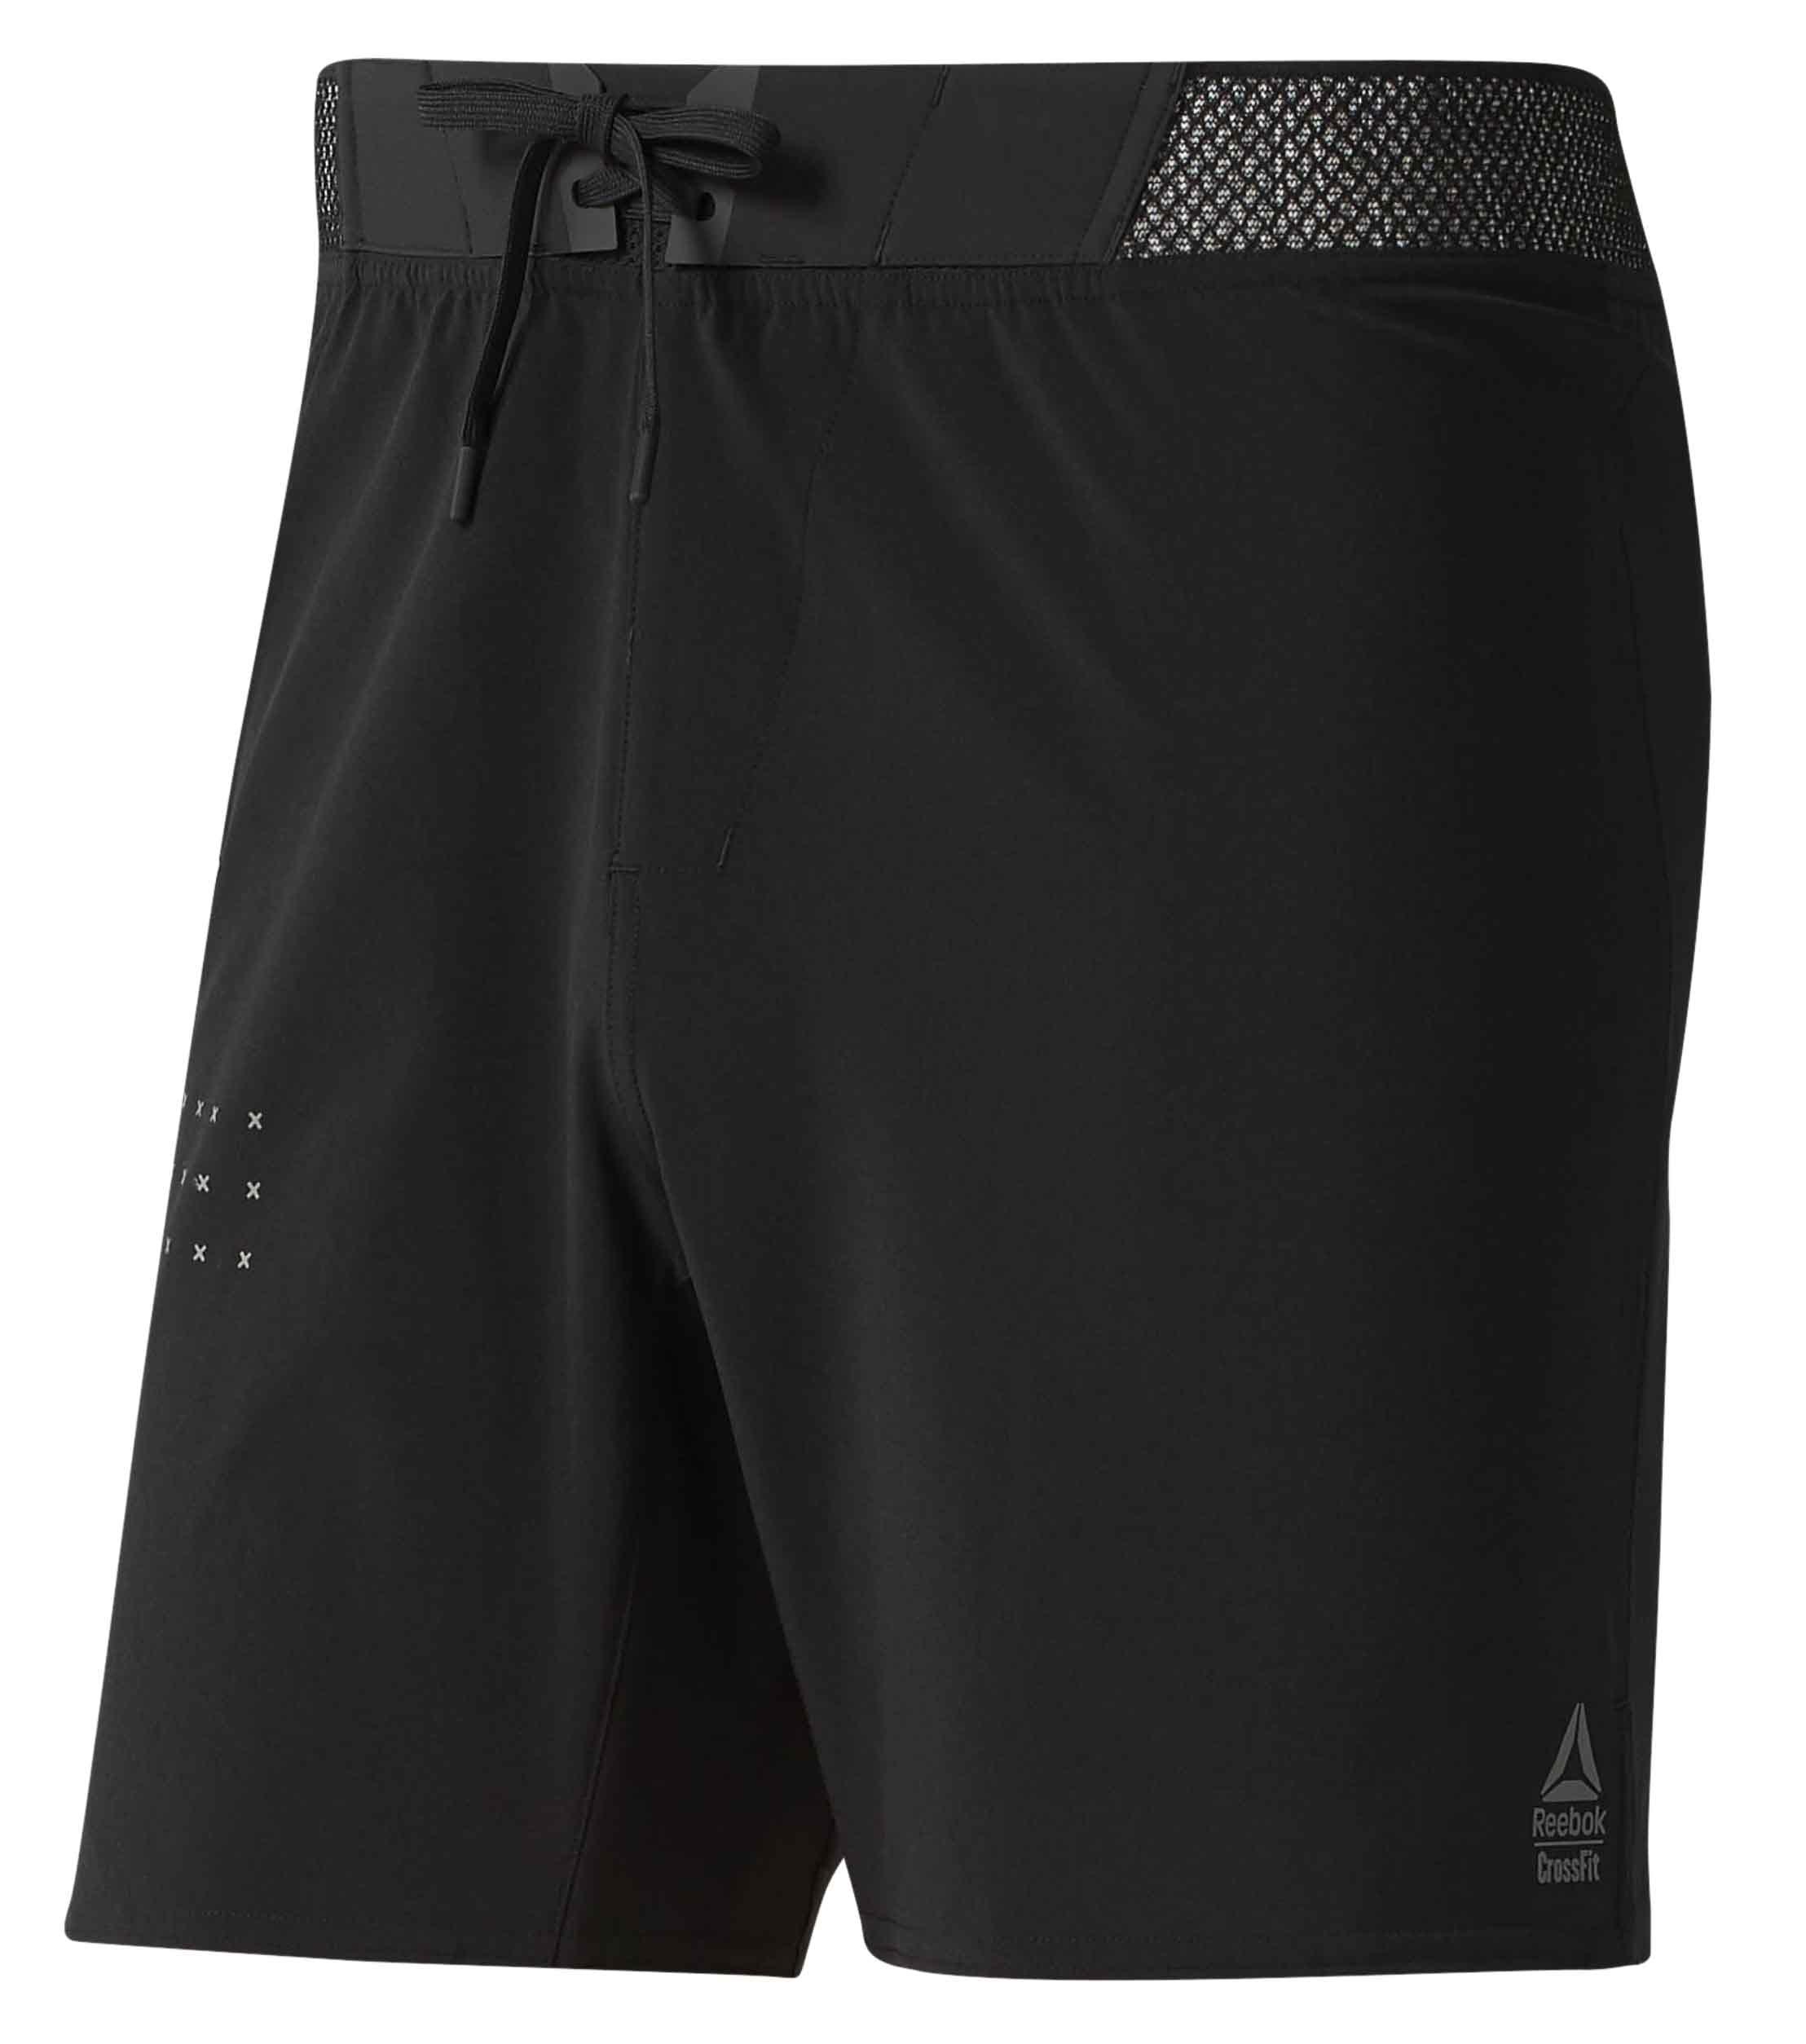 crossfit-shorts-shortest